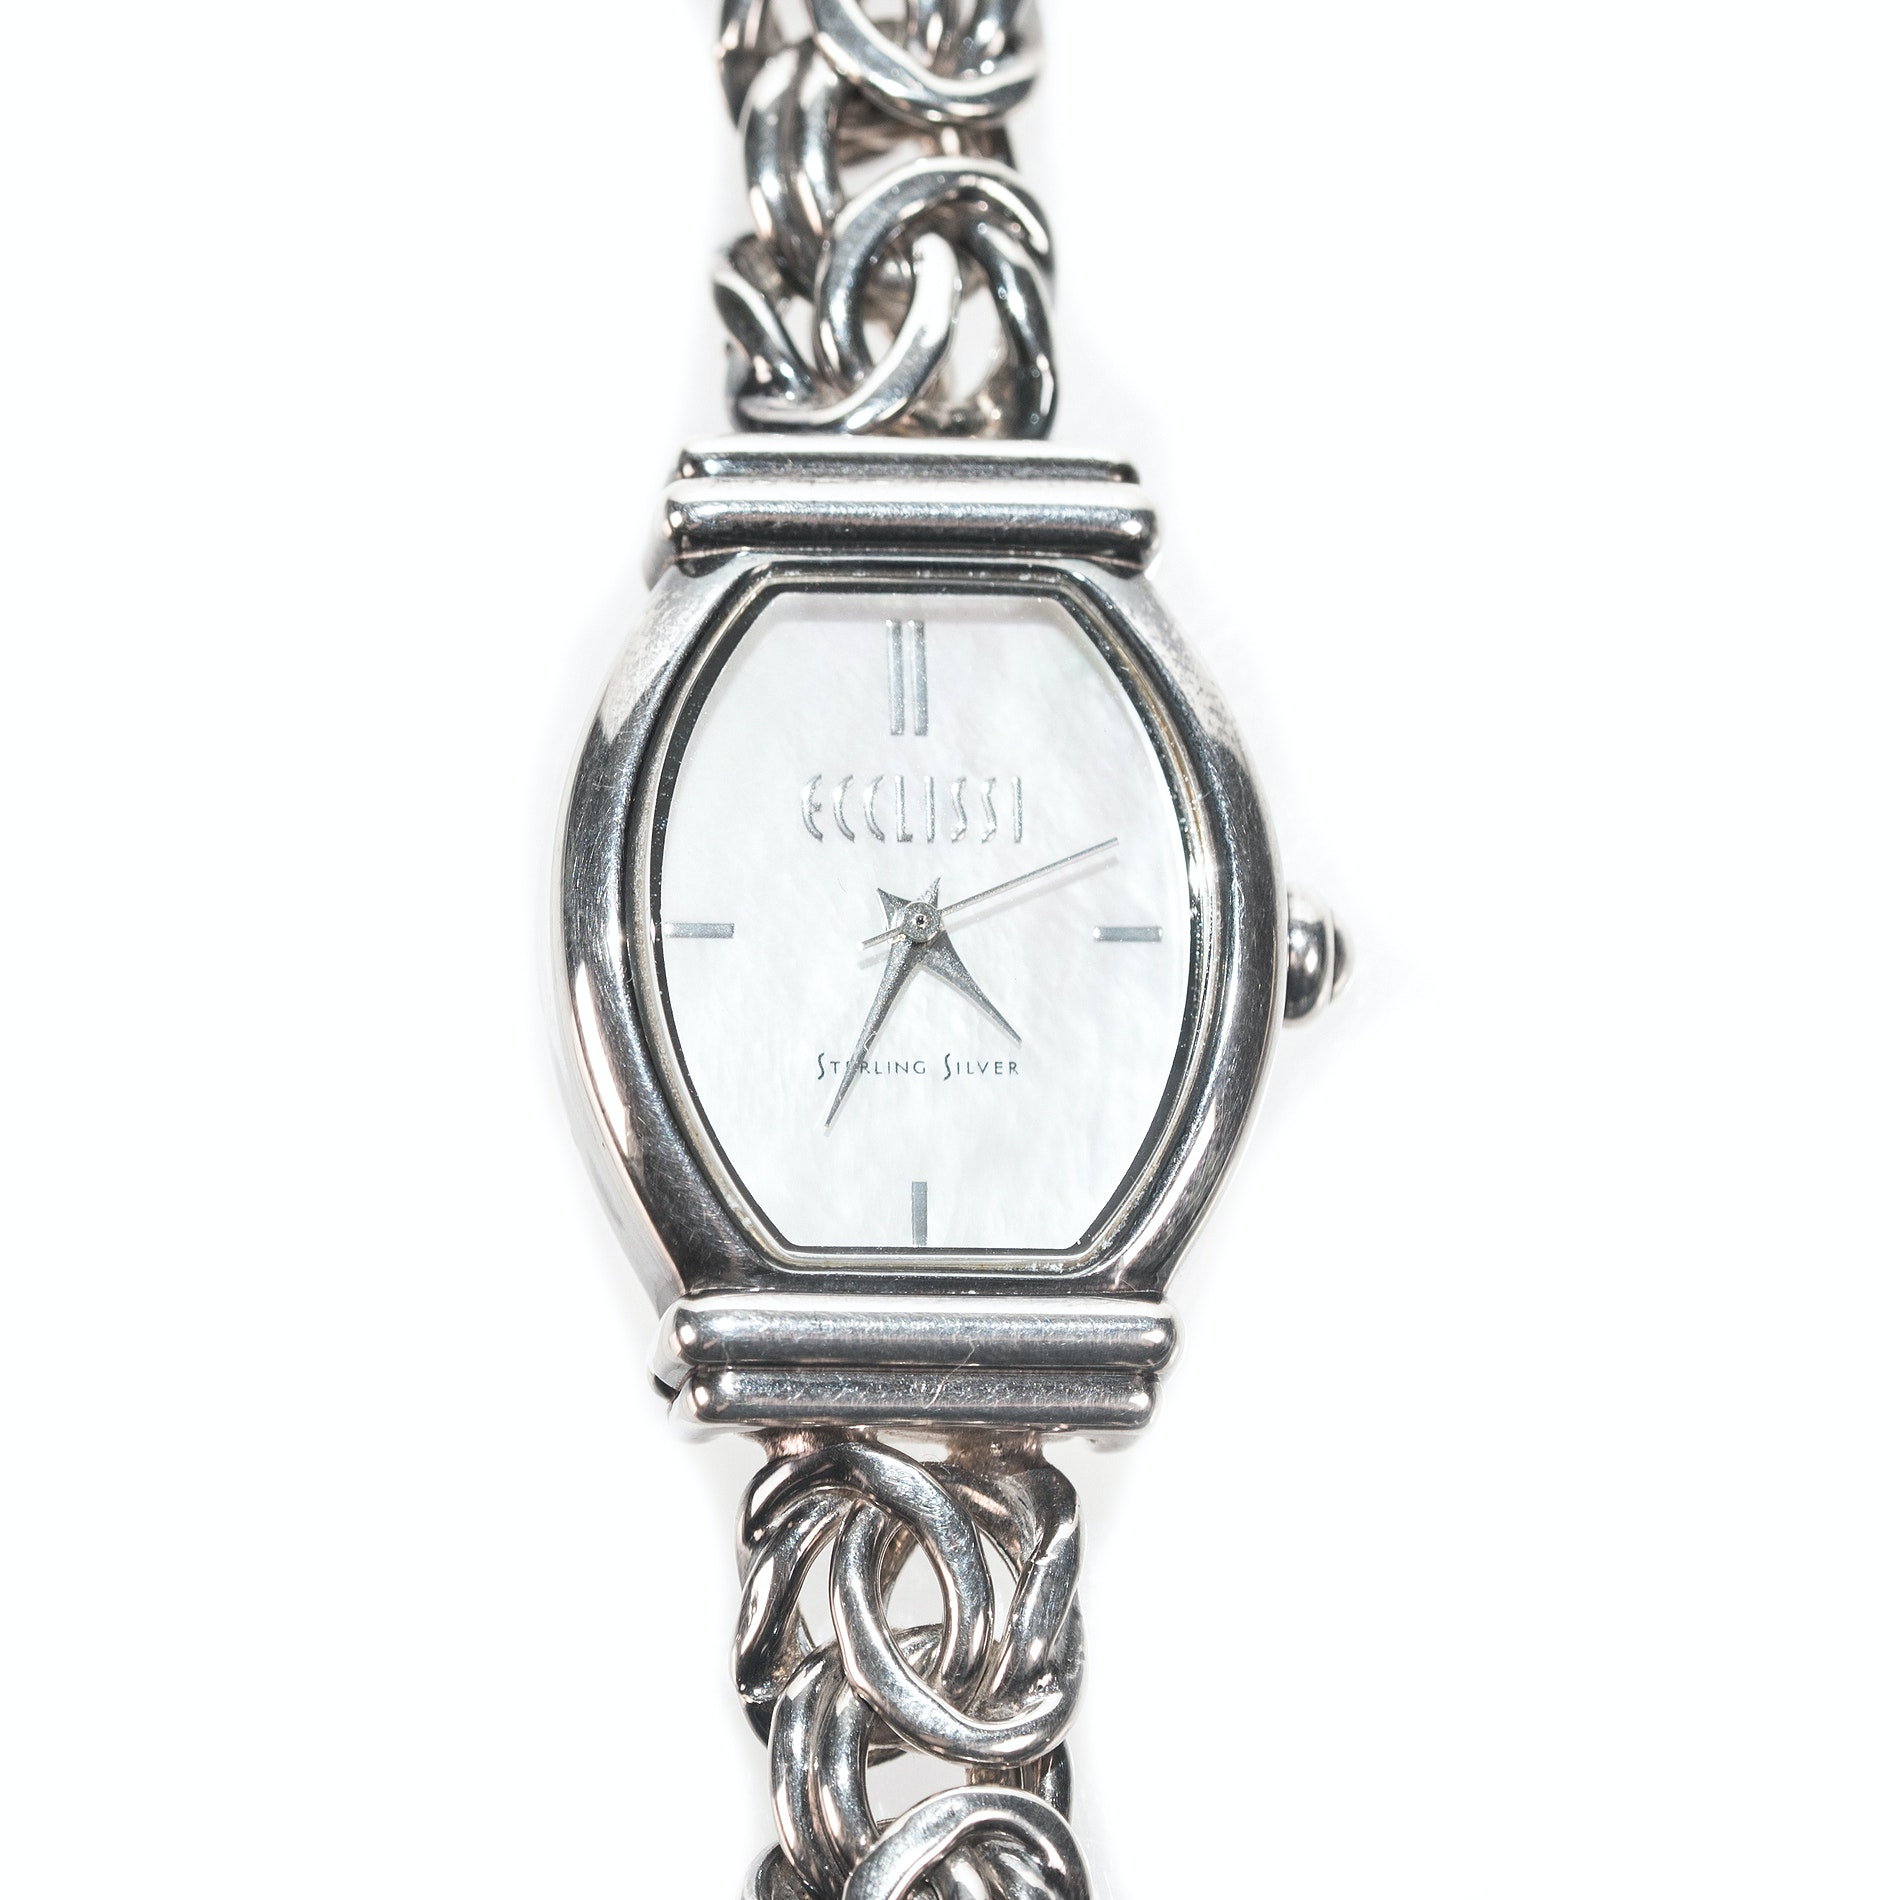 Sterling Silver Ecclissi Wristwatch